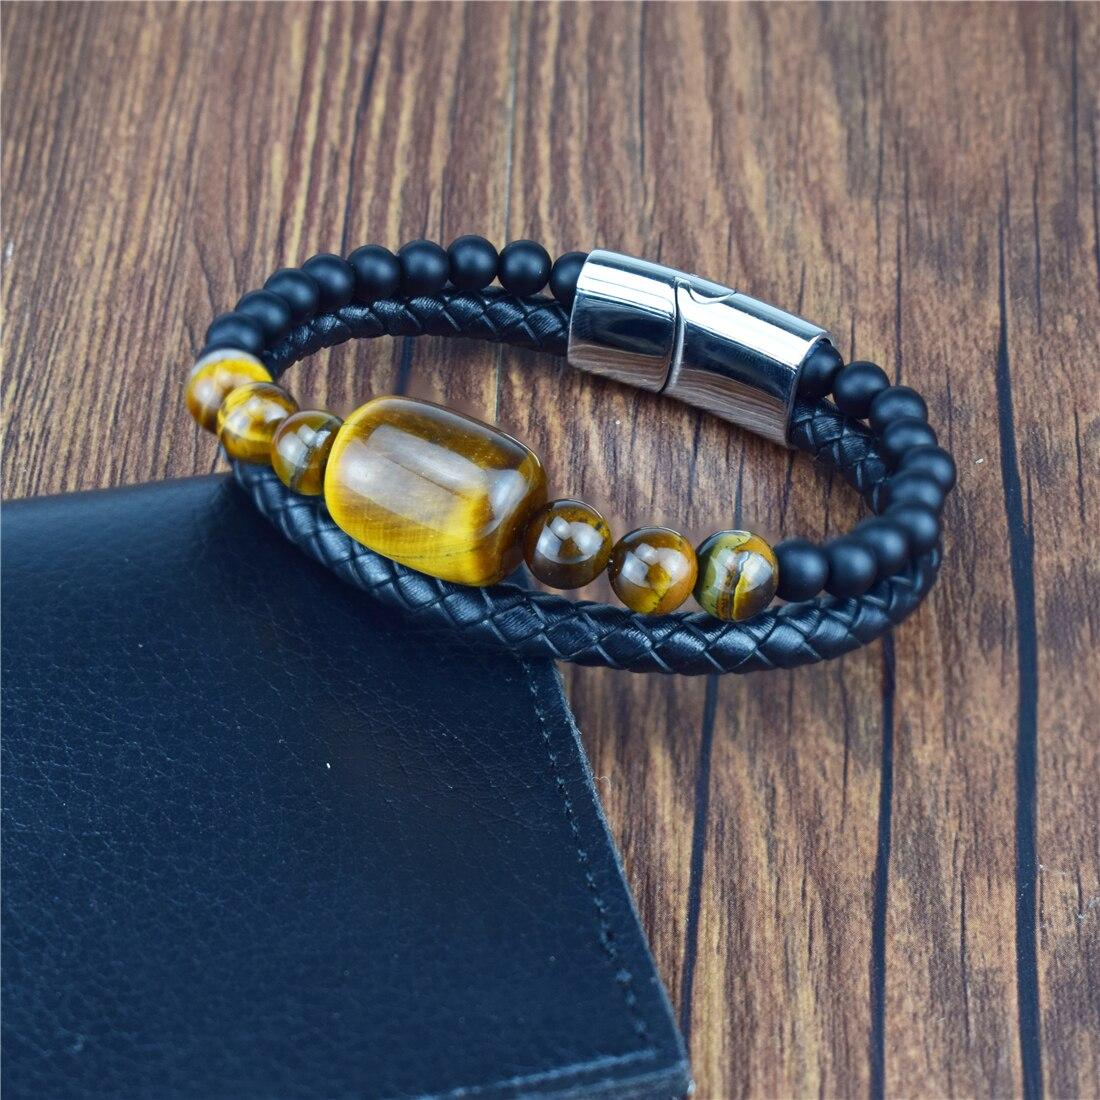 Beaded Bracelet Black Vintage Leather Natural Tiger Eye Stone Beads